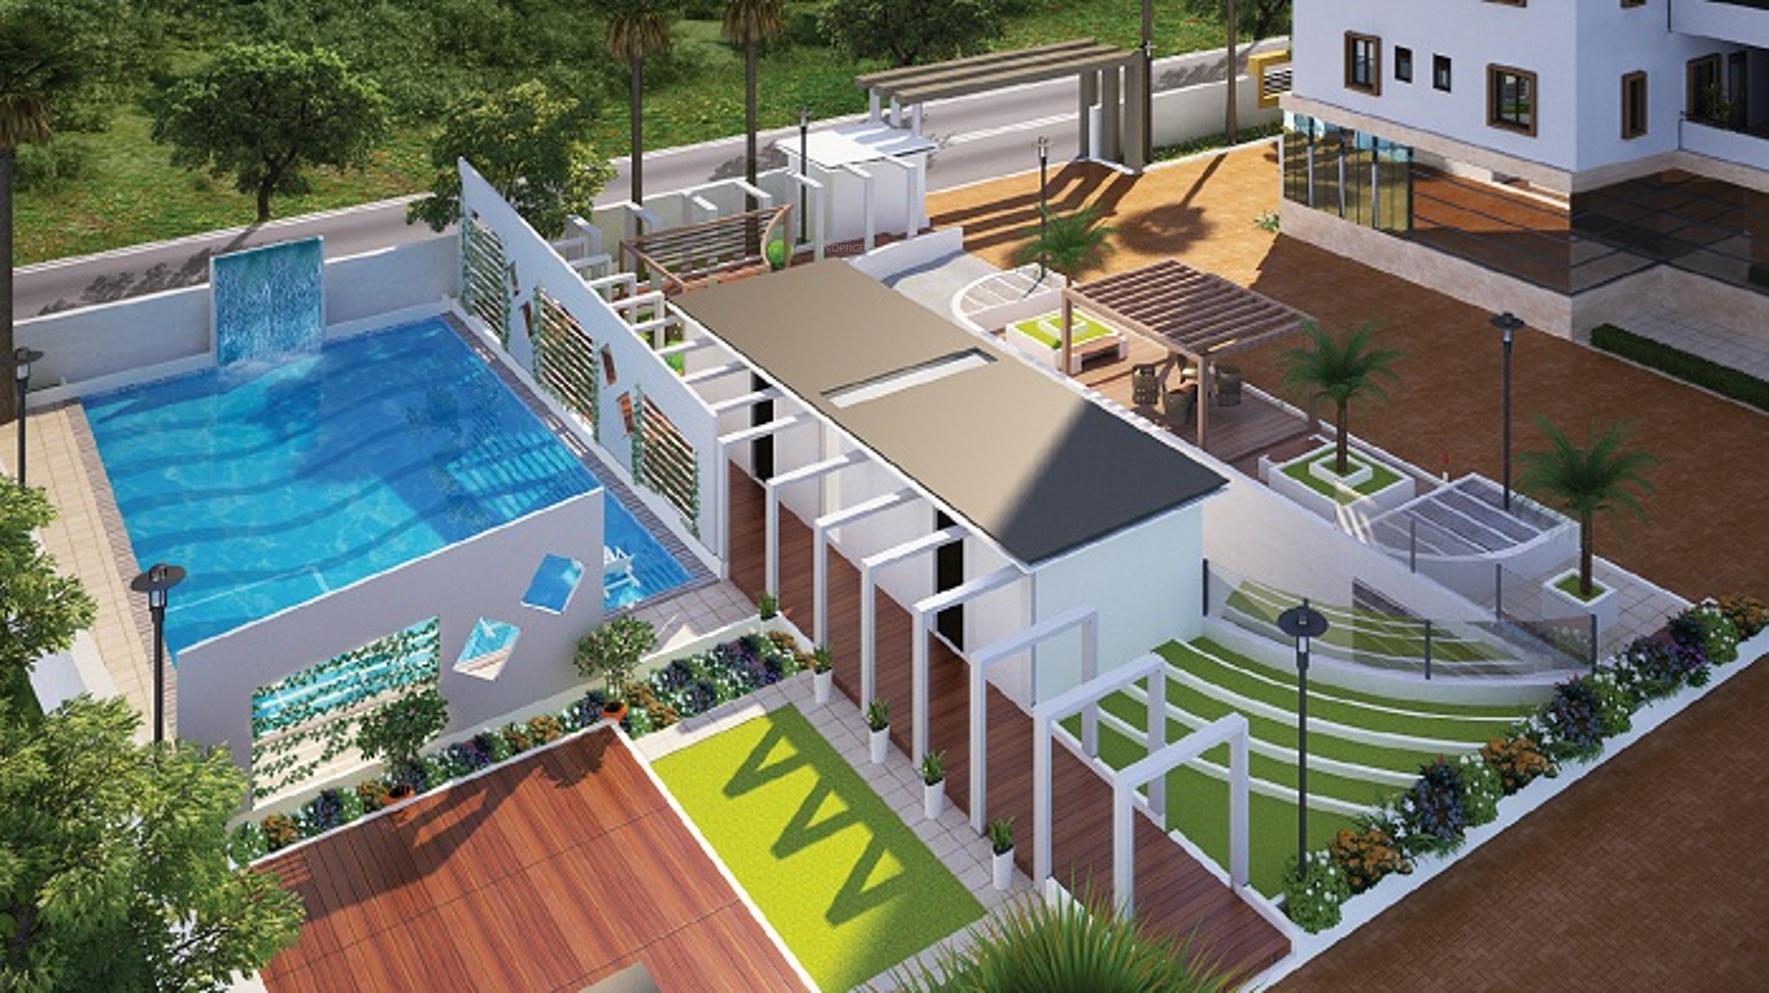 Indya mist in sahakar nagar bangalore price location map floor plan reviews for Swimming pool near sahakar nagar bangalore